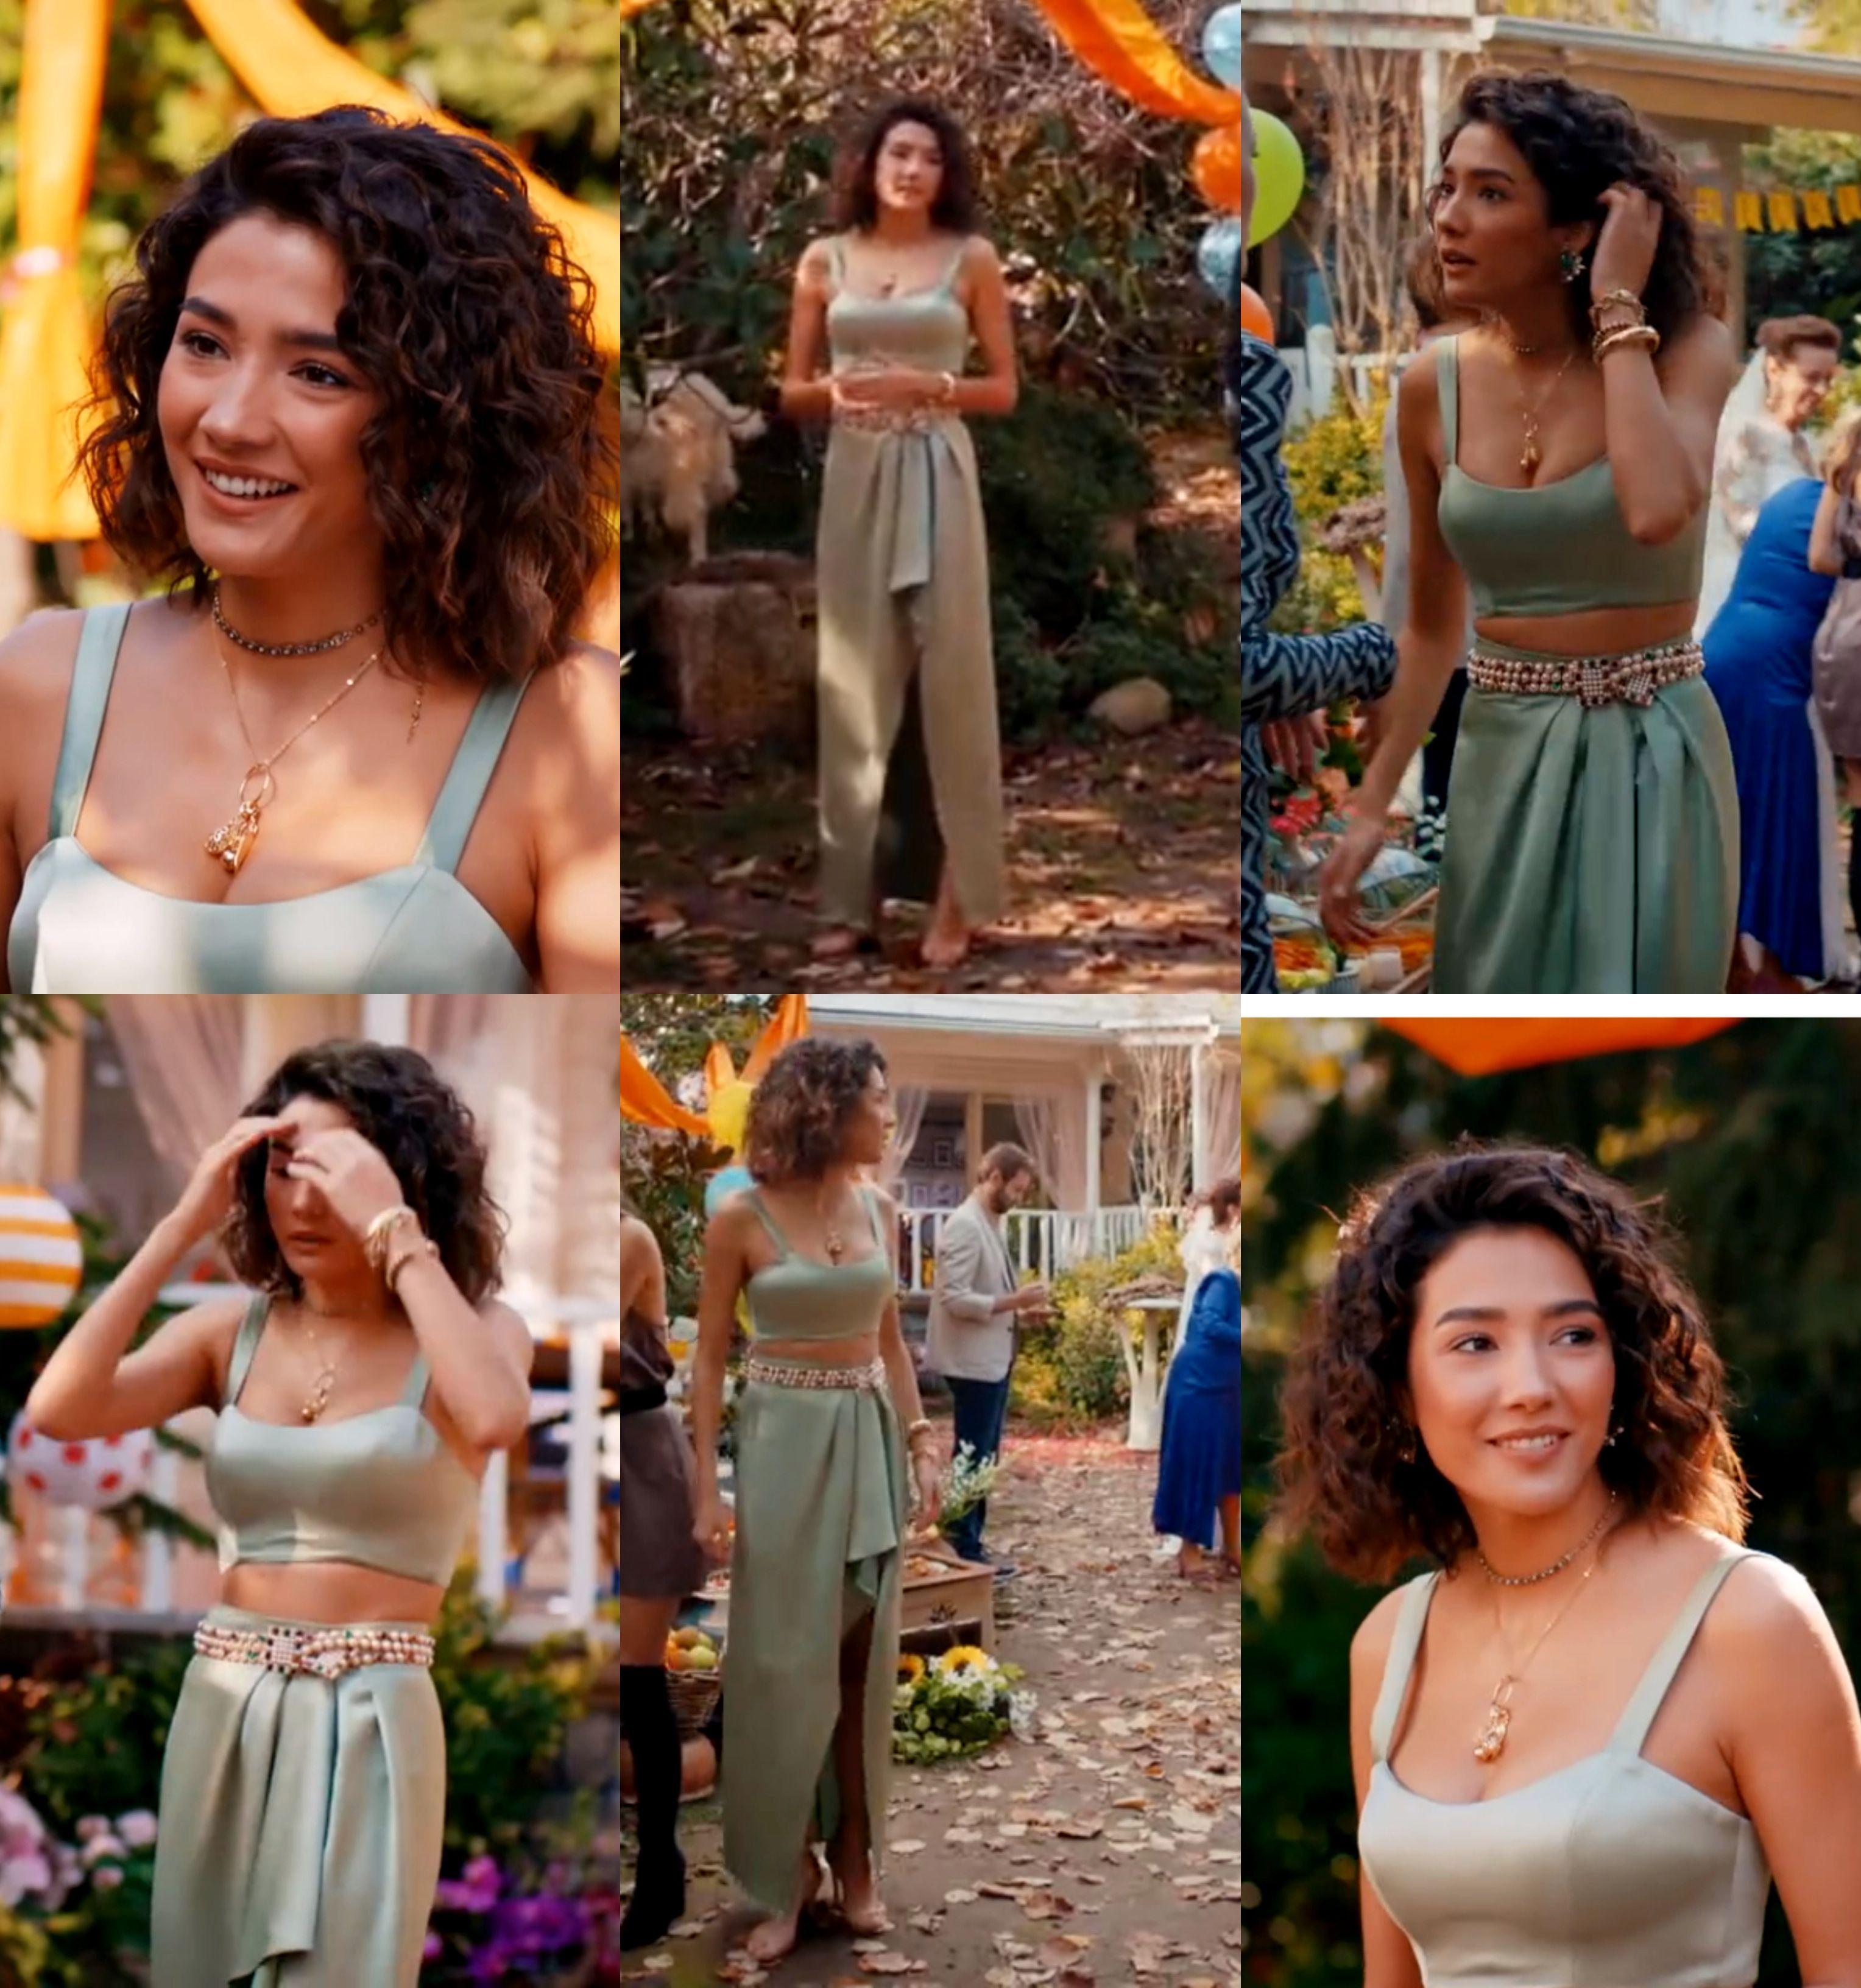 Selin 23 Episode Her Yerde Sen Tv Show Outfits Teenage Fashion Outfits Fashion Teenage